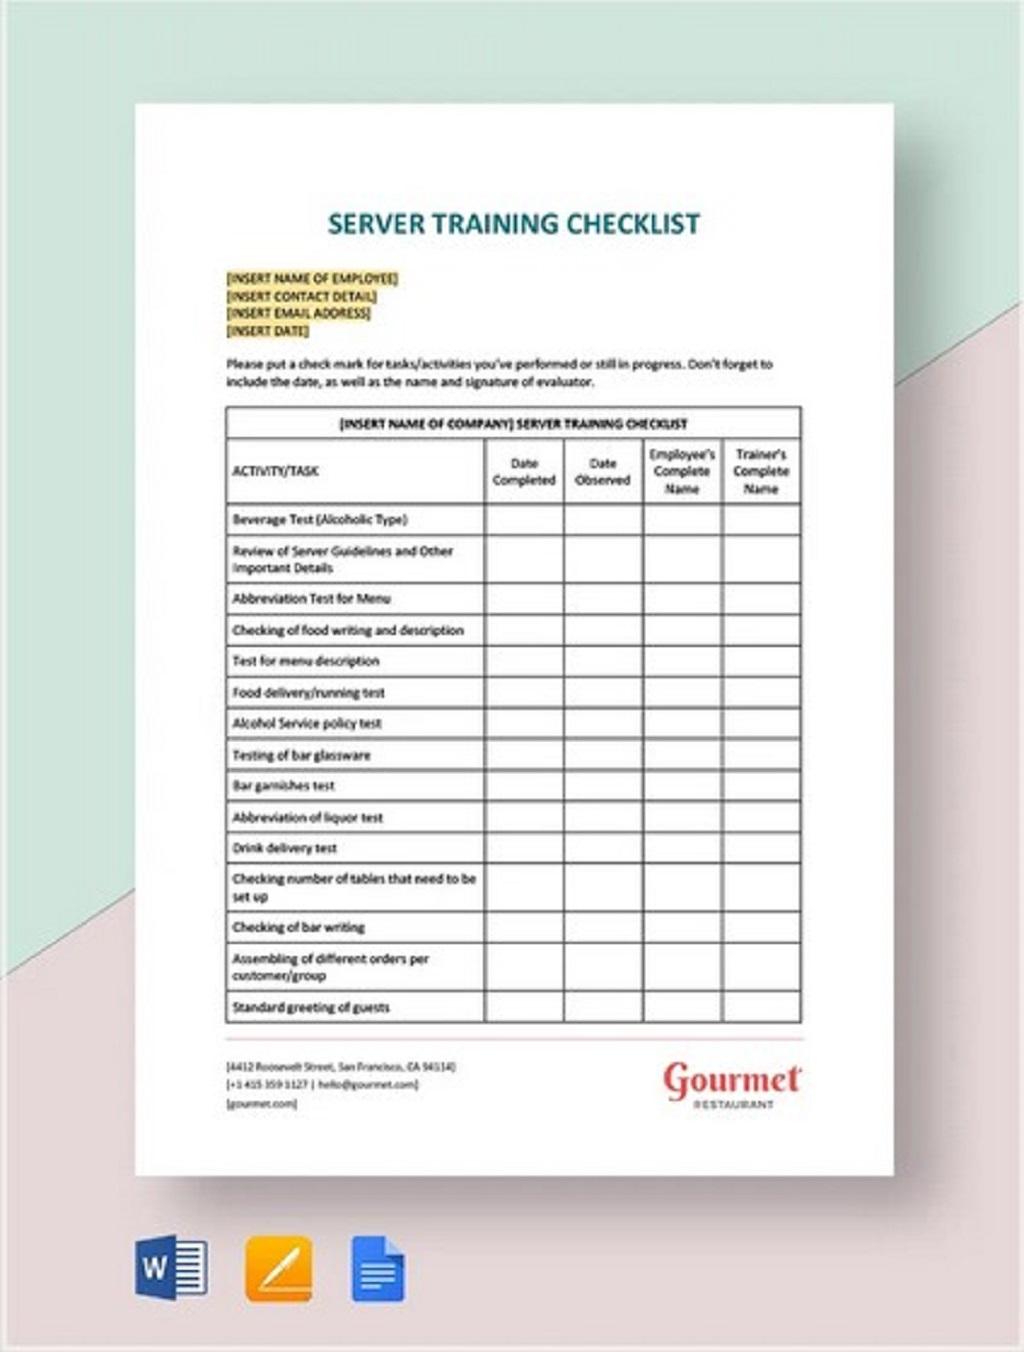 Server Training Checklist Template Employee Word Pdf Google Docs  Samples Large